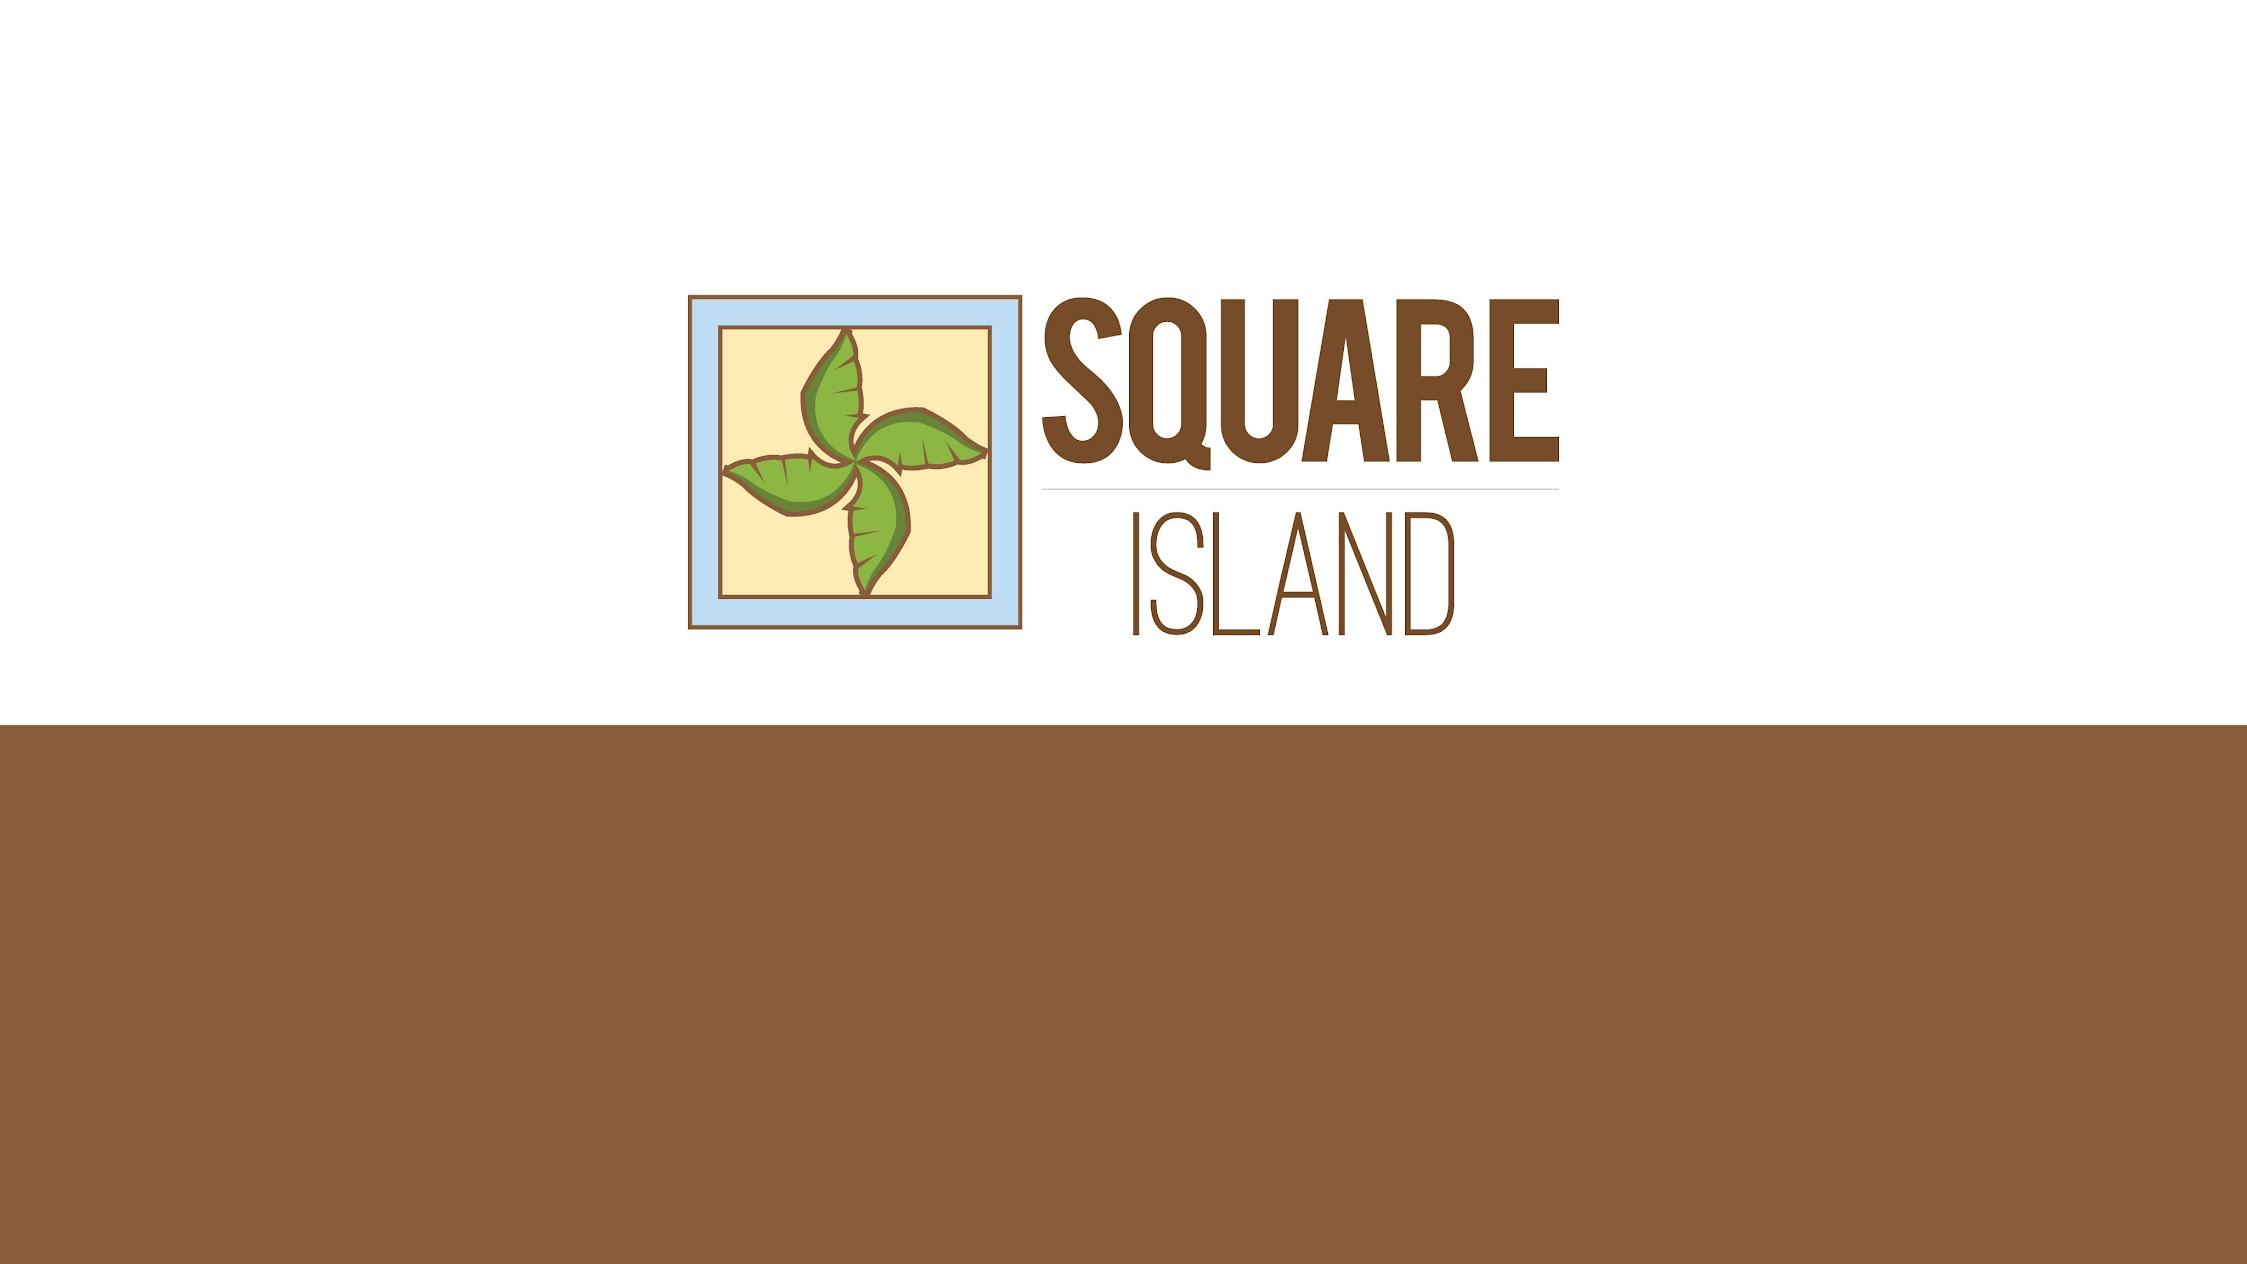 Square Island